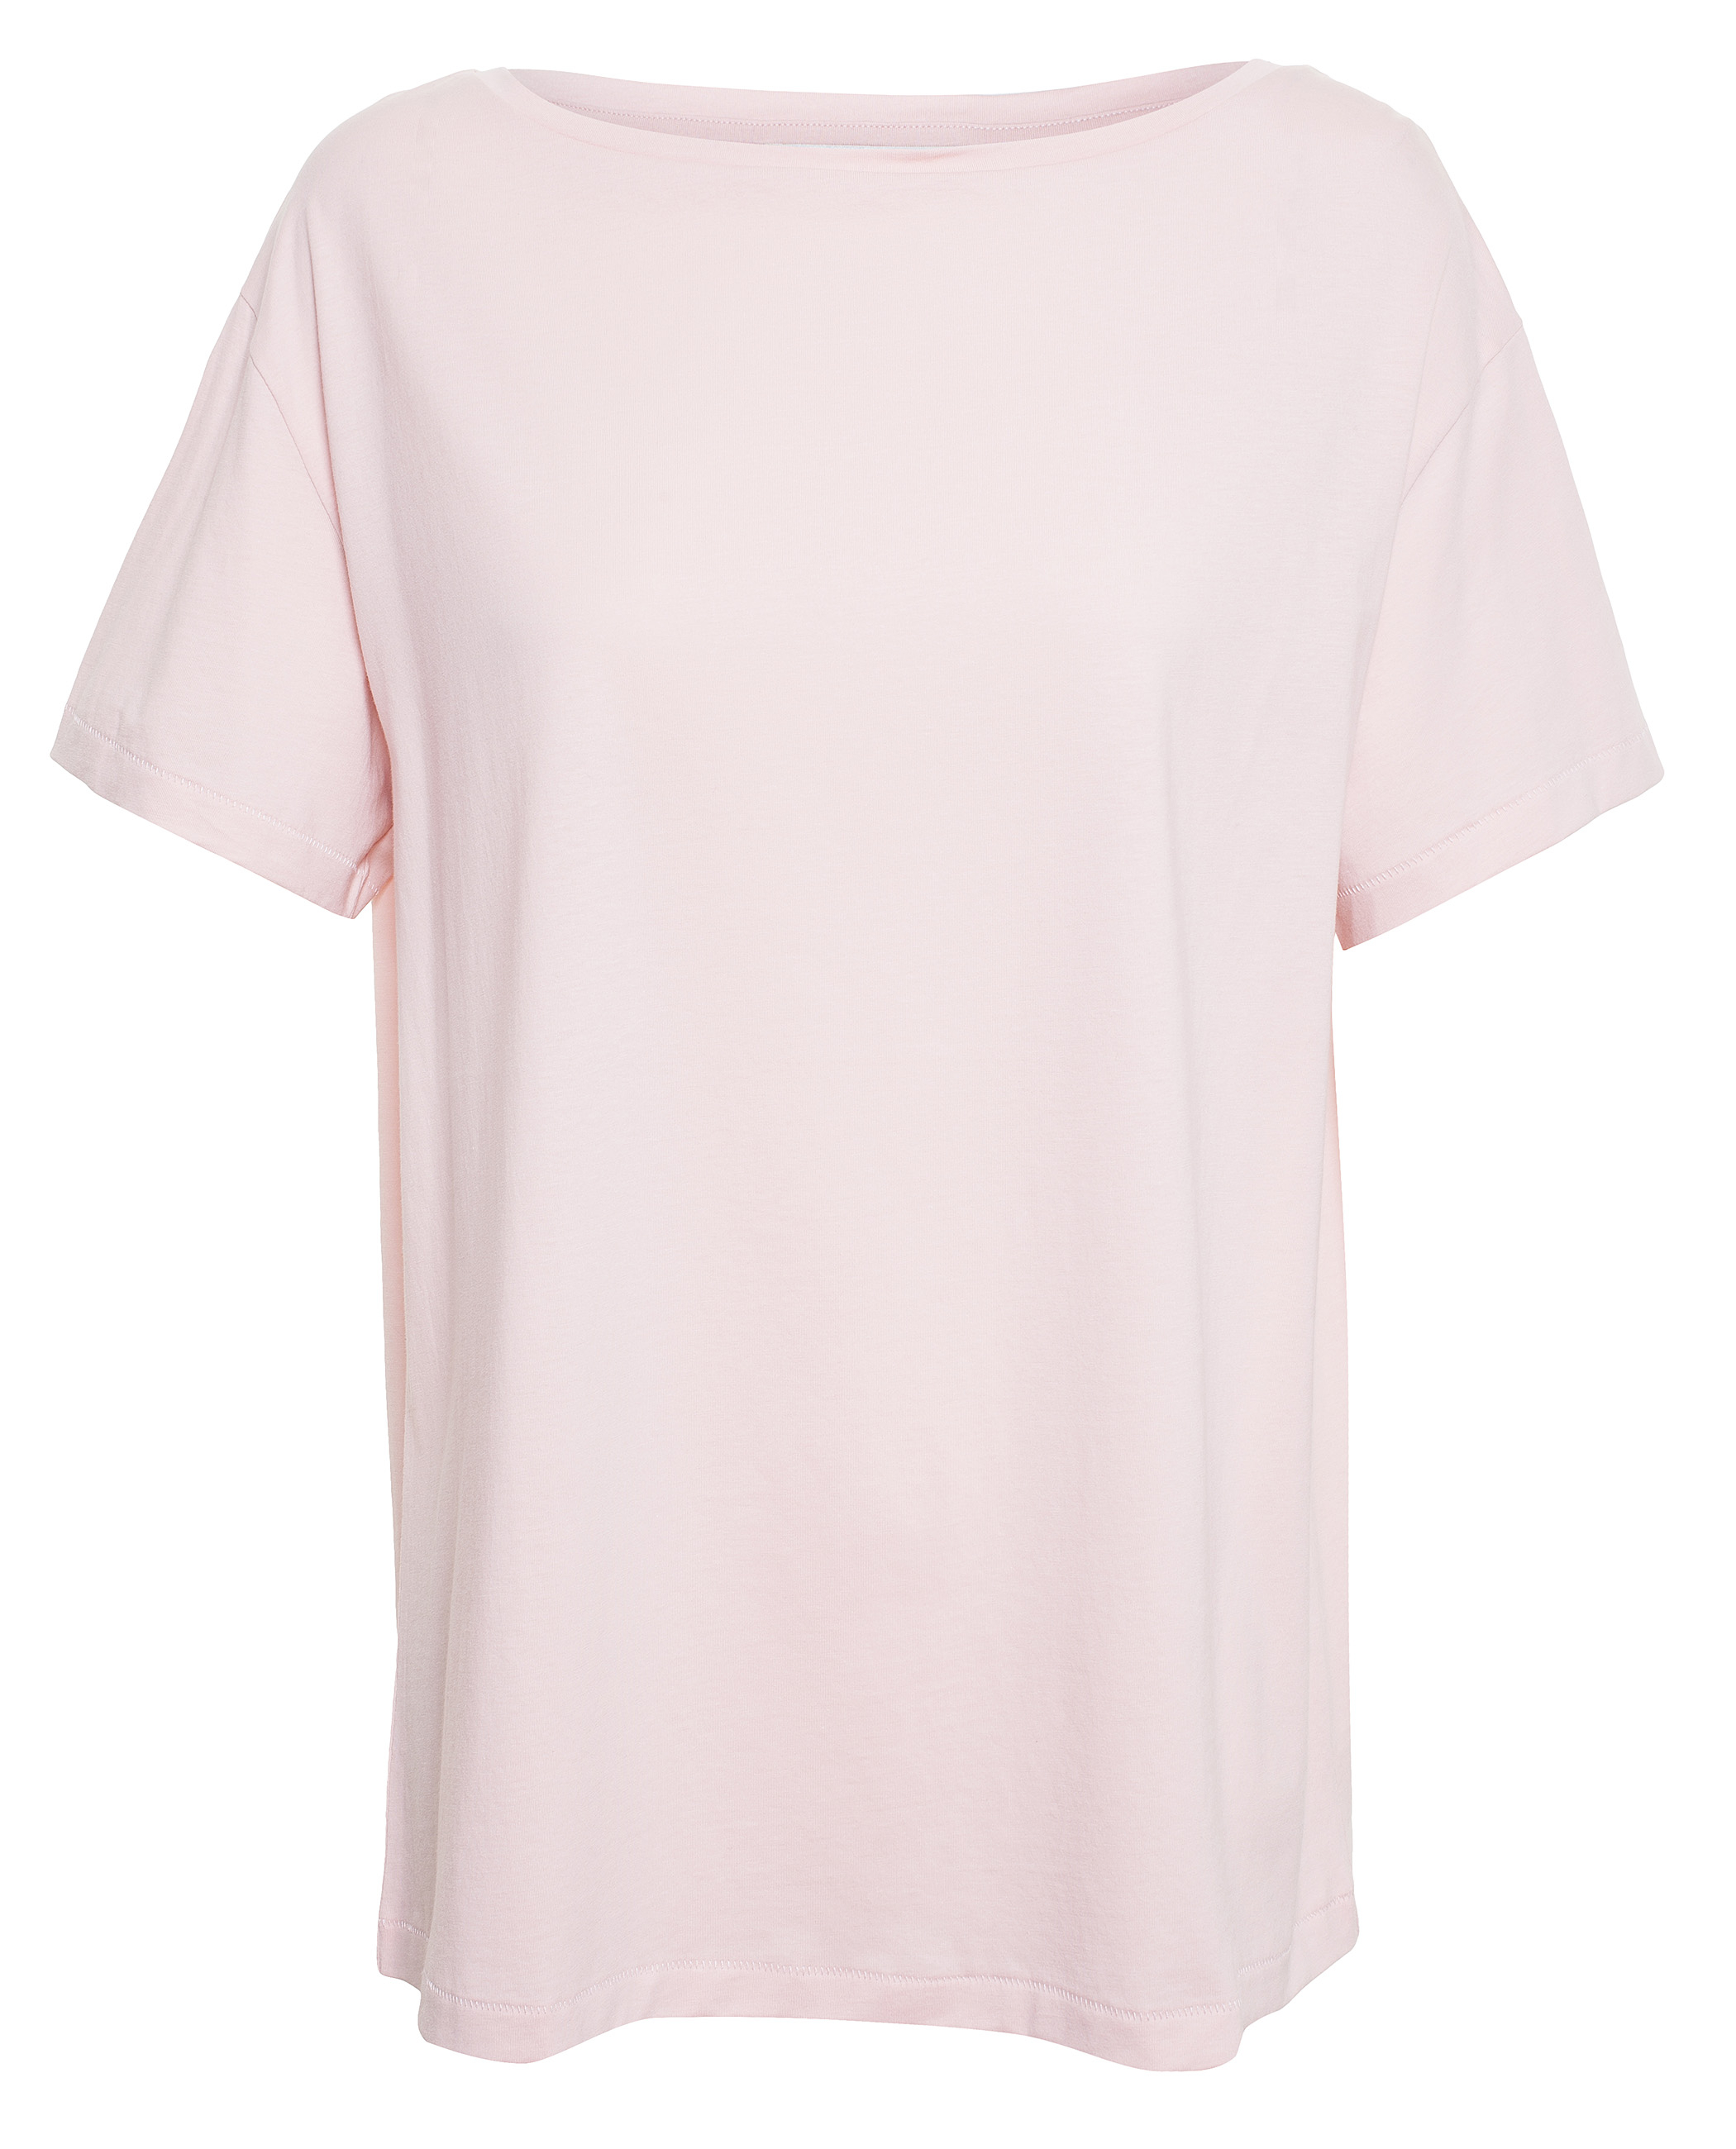 Pink pastel shirt south park t shirts for Pastel pink dress shirt